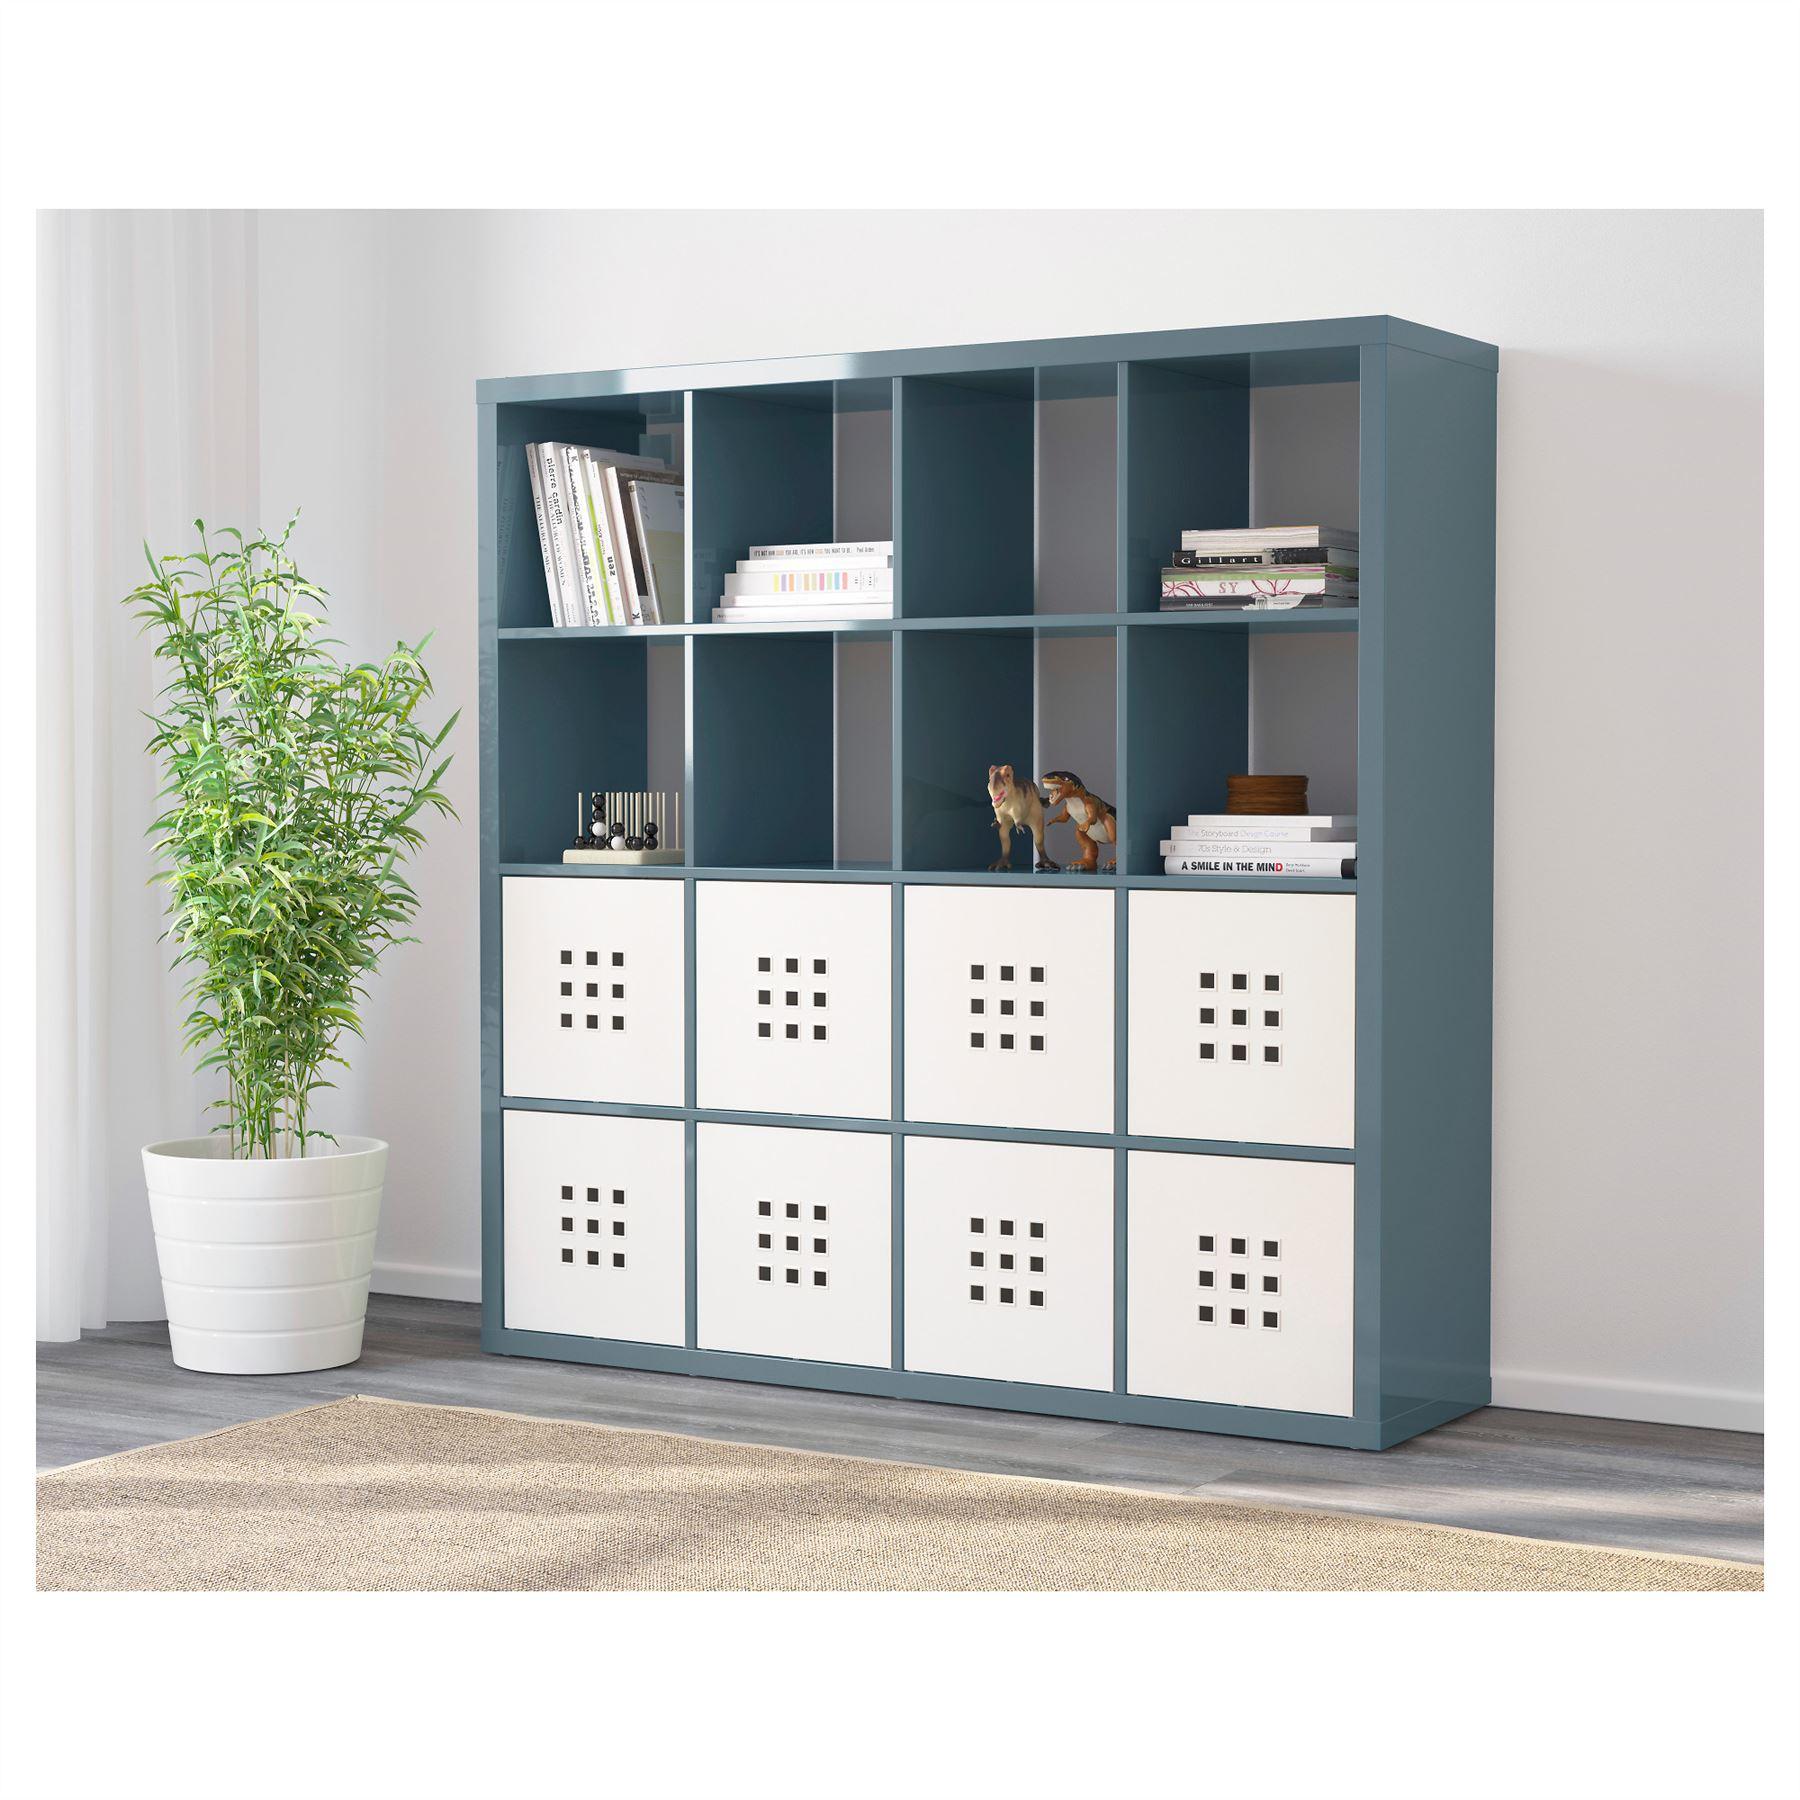 ikea kallax 16 cube storage bookcase square shelving unit various colours ebay. Black Bedroom Furniture Sets. Home Design Ideas